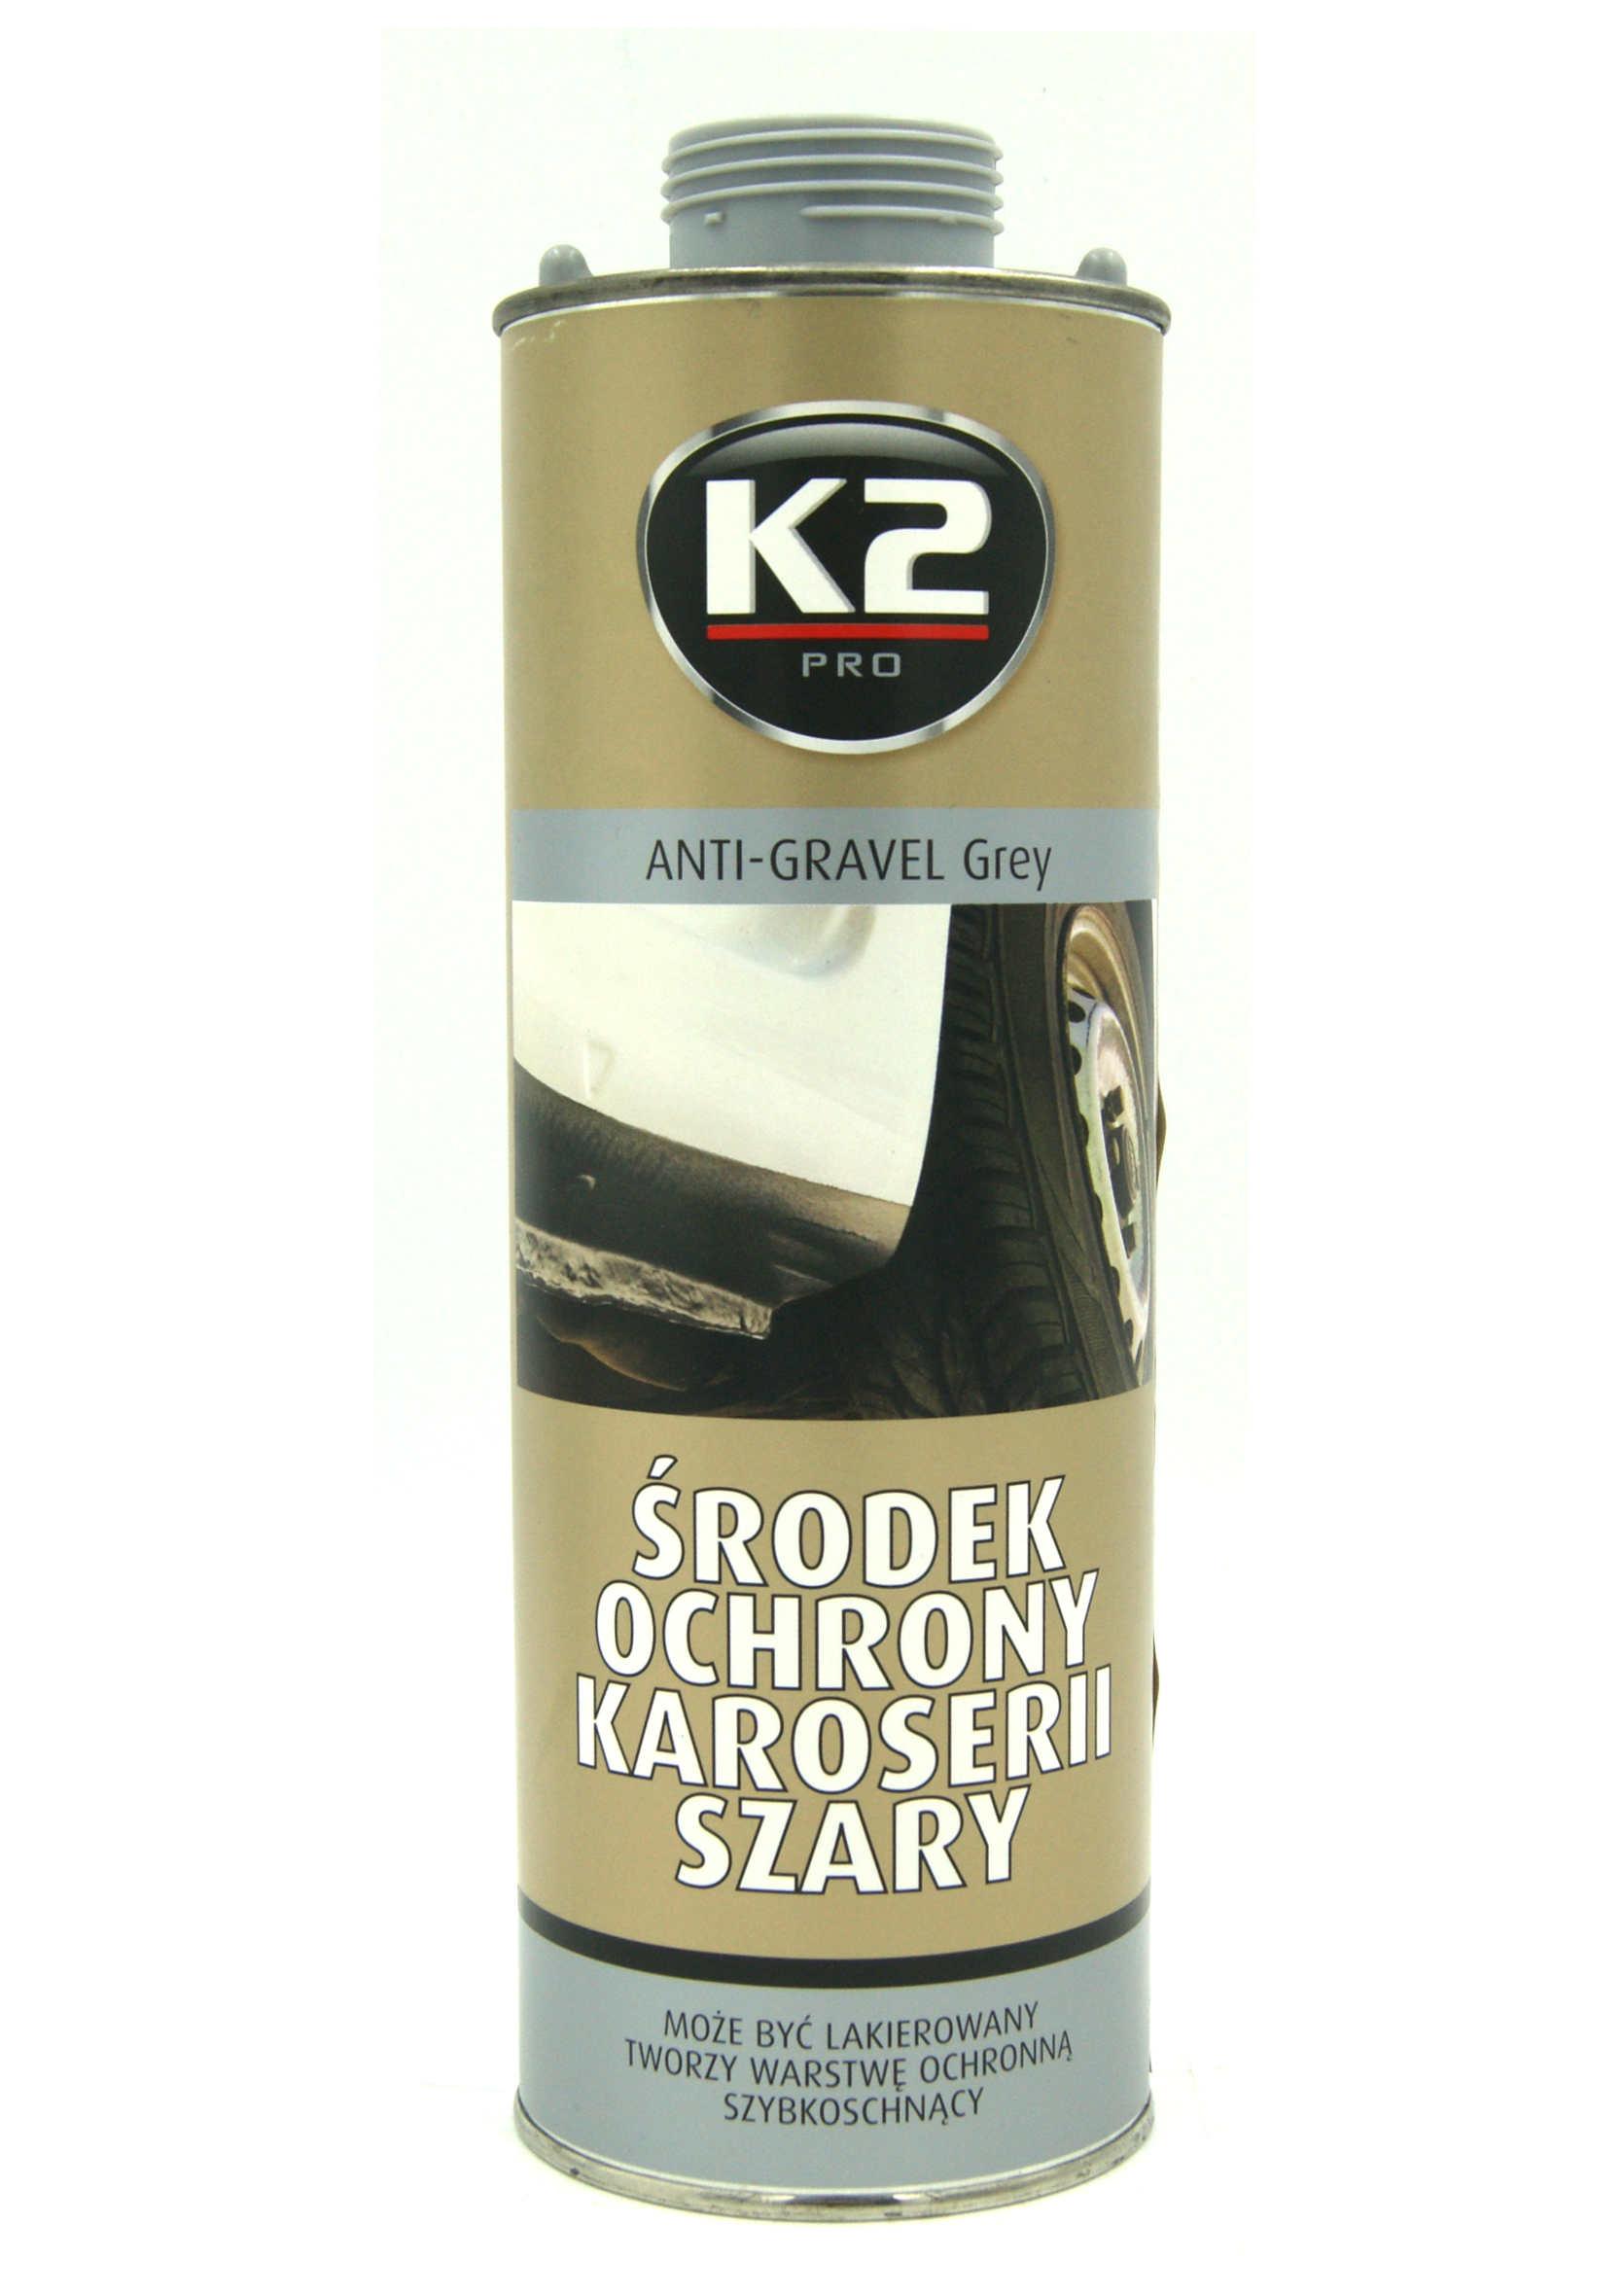 K2 Środek Ochrony Karoserii Szary 1L Baranek do Konserwacji Podwozia na Pistolet